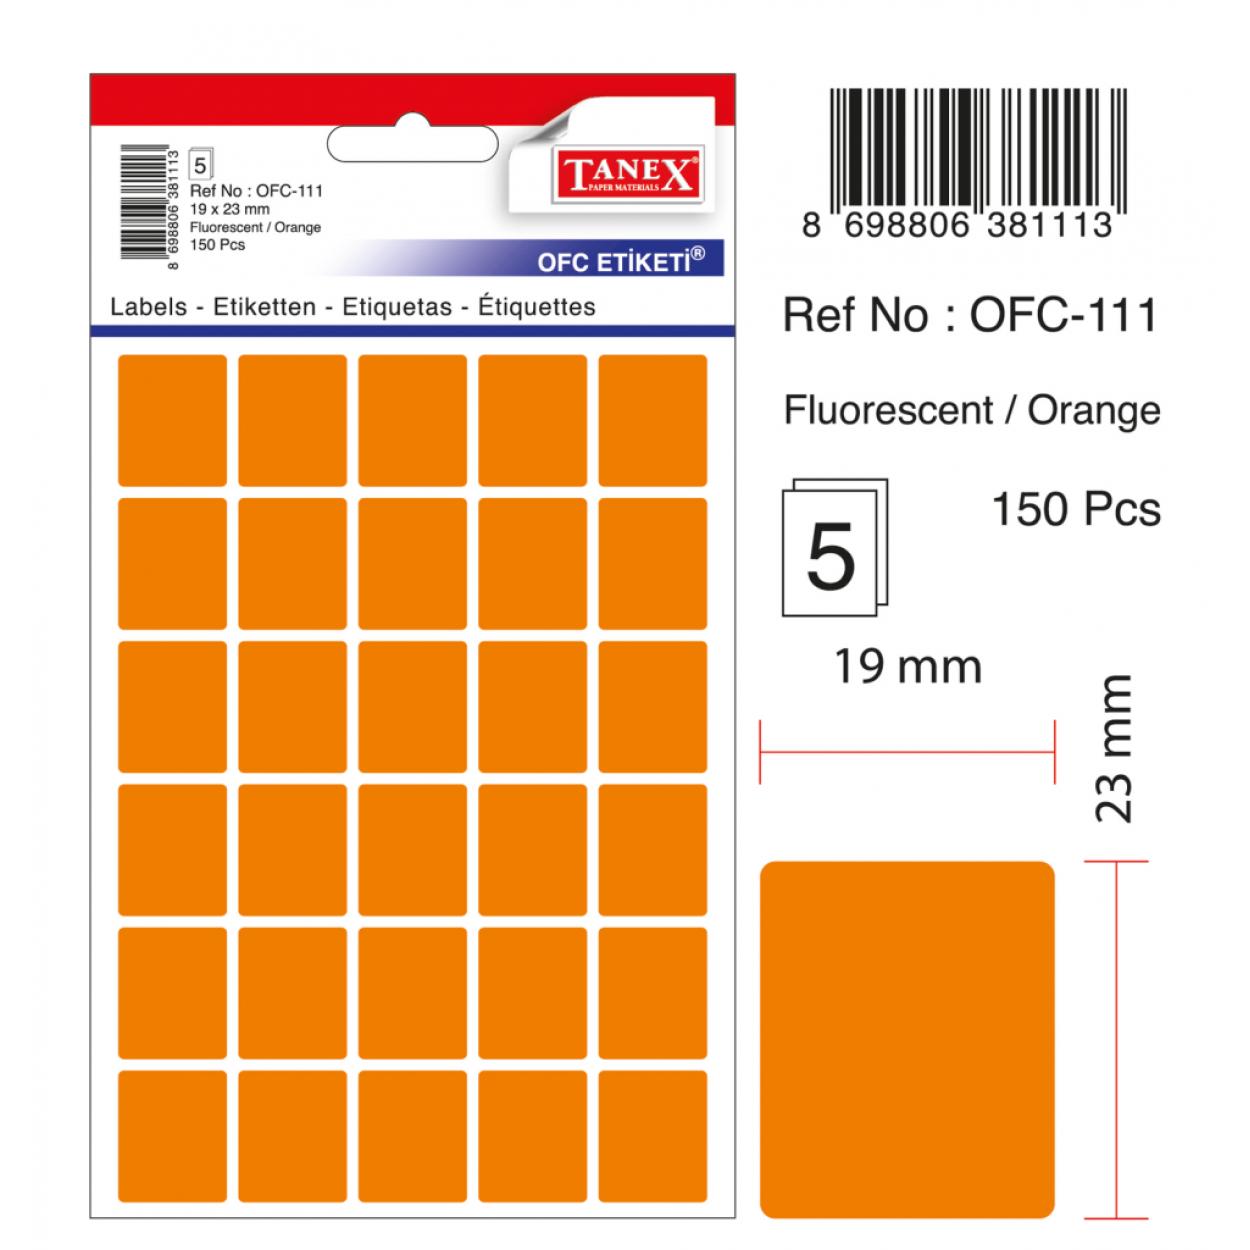 Tanex Ofc-111 Turuncu Ofis Etiketi